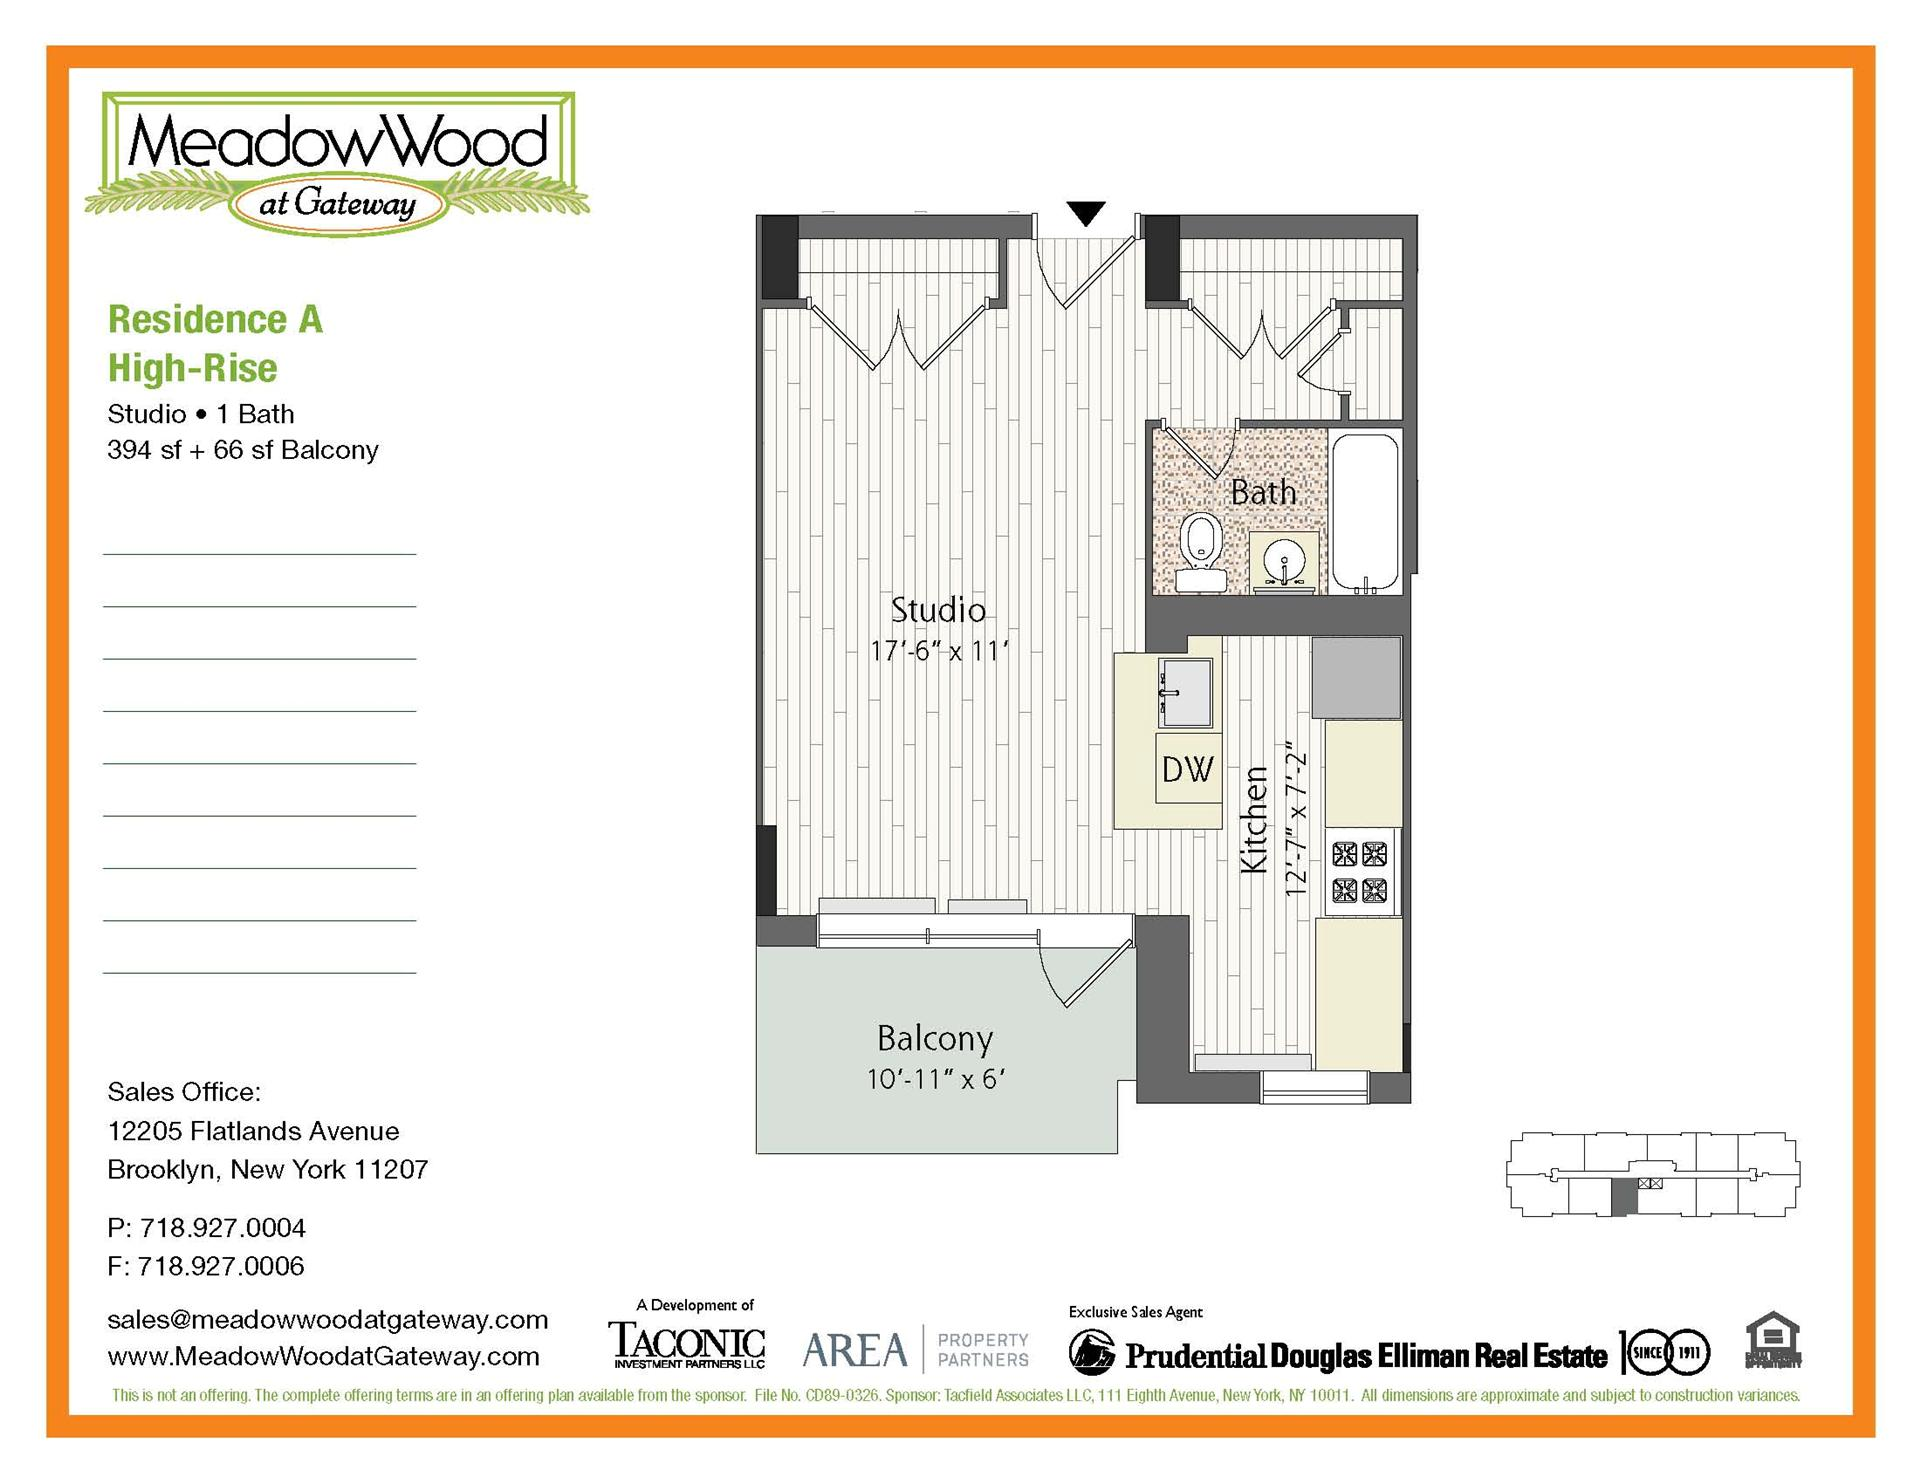 Condo Apartment Sale At MeadowWood